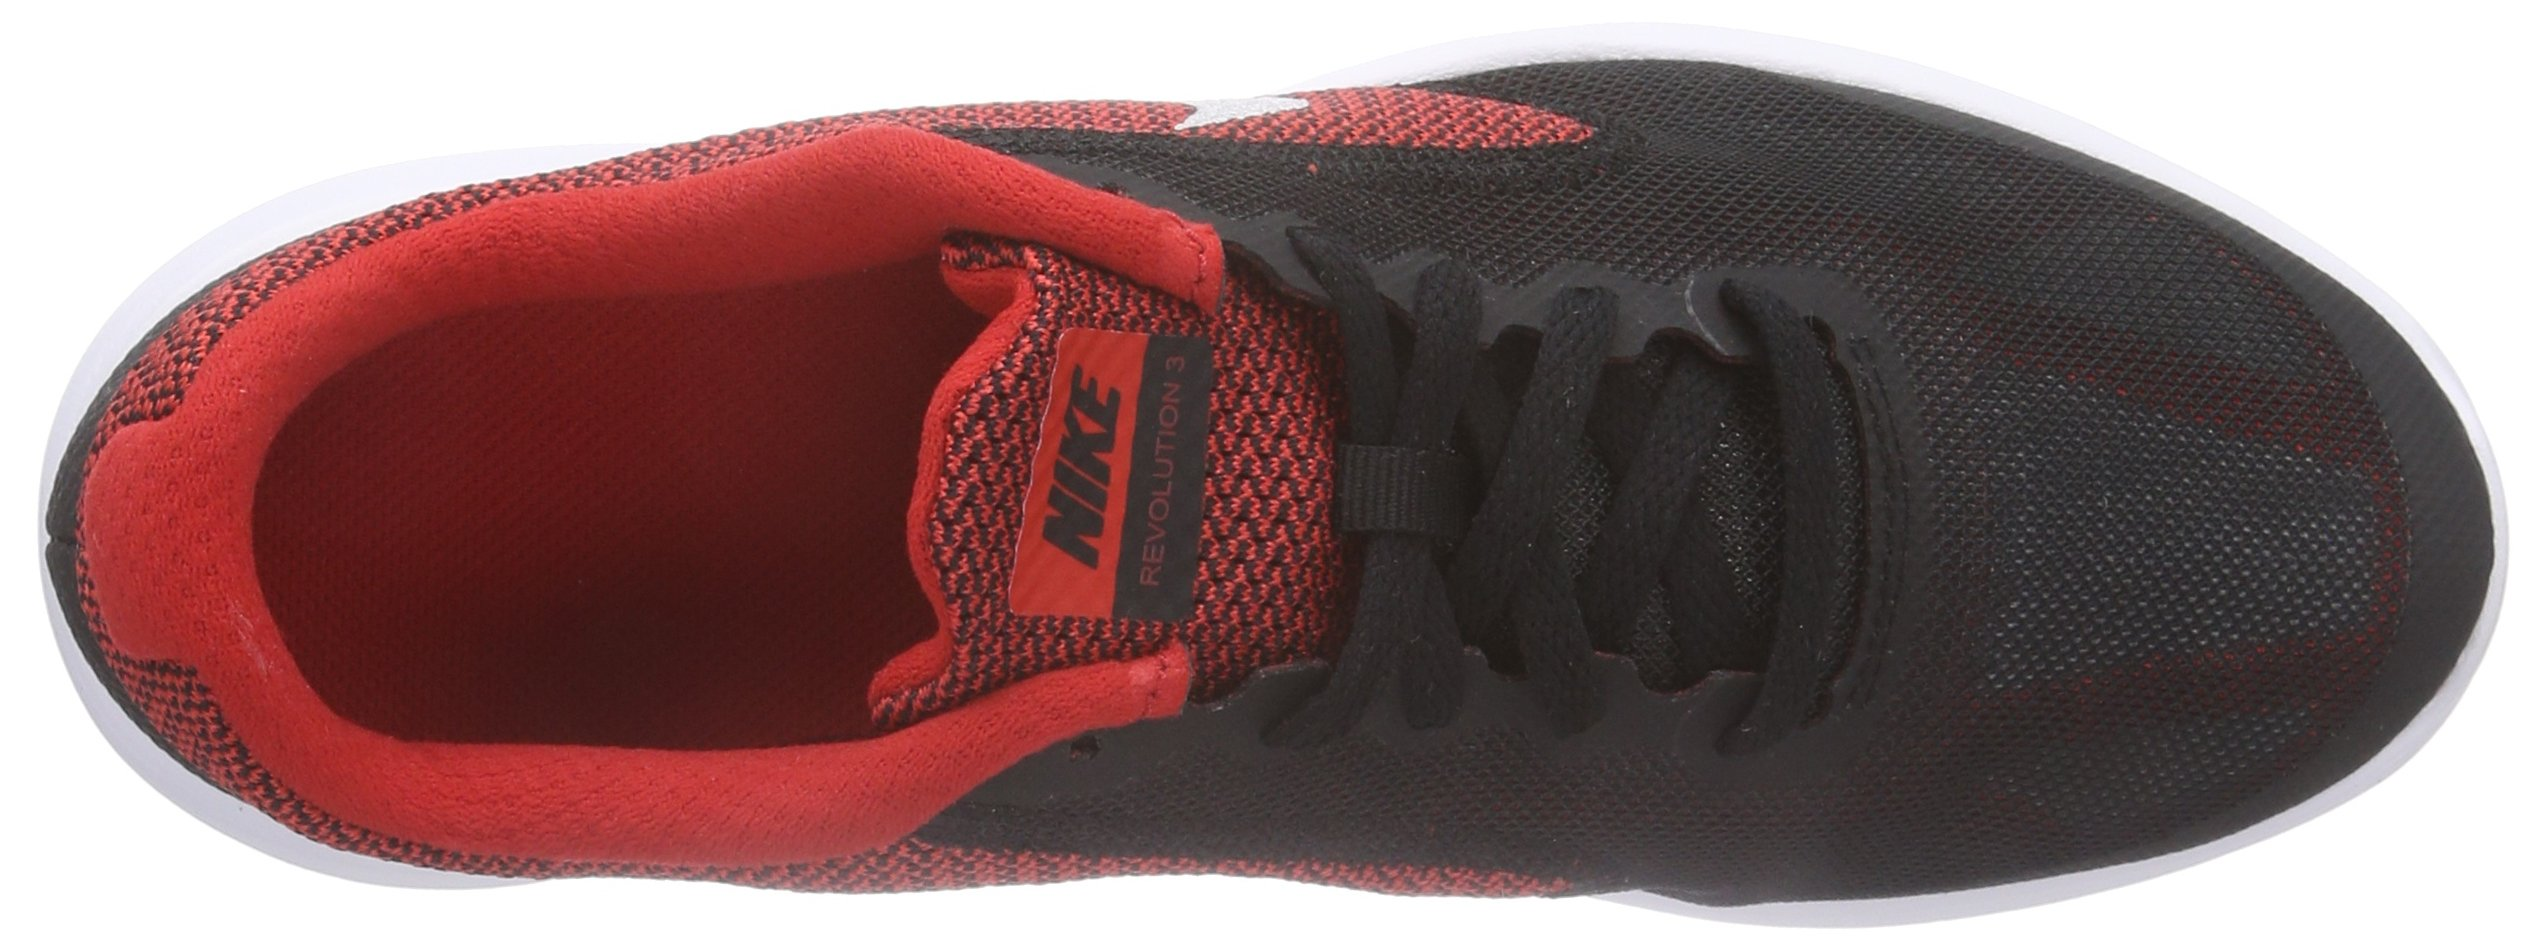 NIKE Boys' Revolution 3 Running Shoe (GS), University Red/Metallic Silver/Black, 3.5 M US Big Kid by Nike (Image #7)